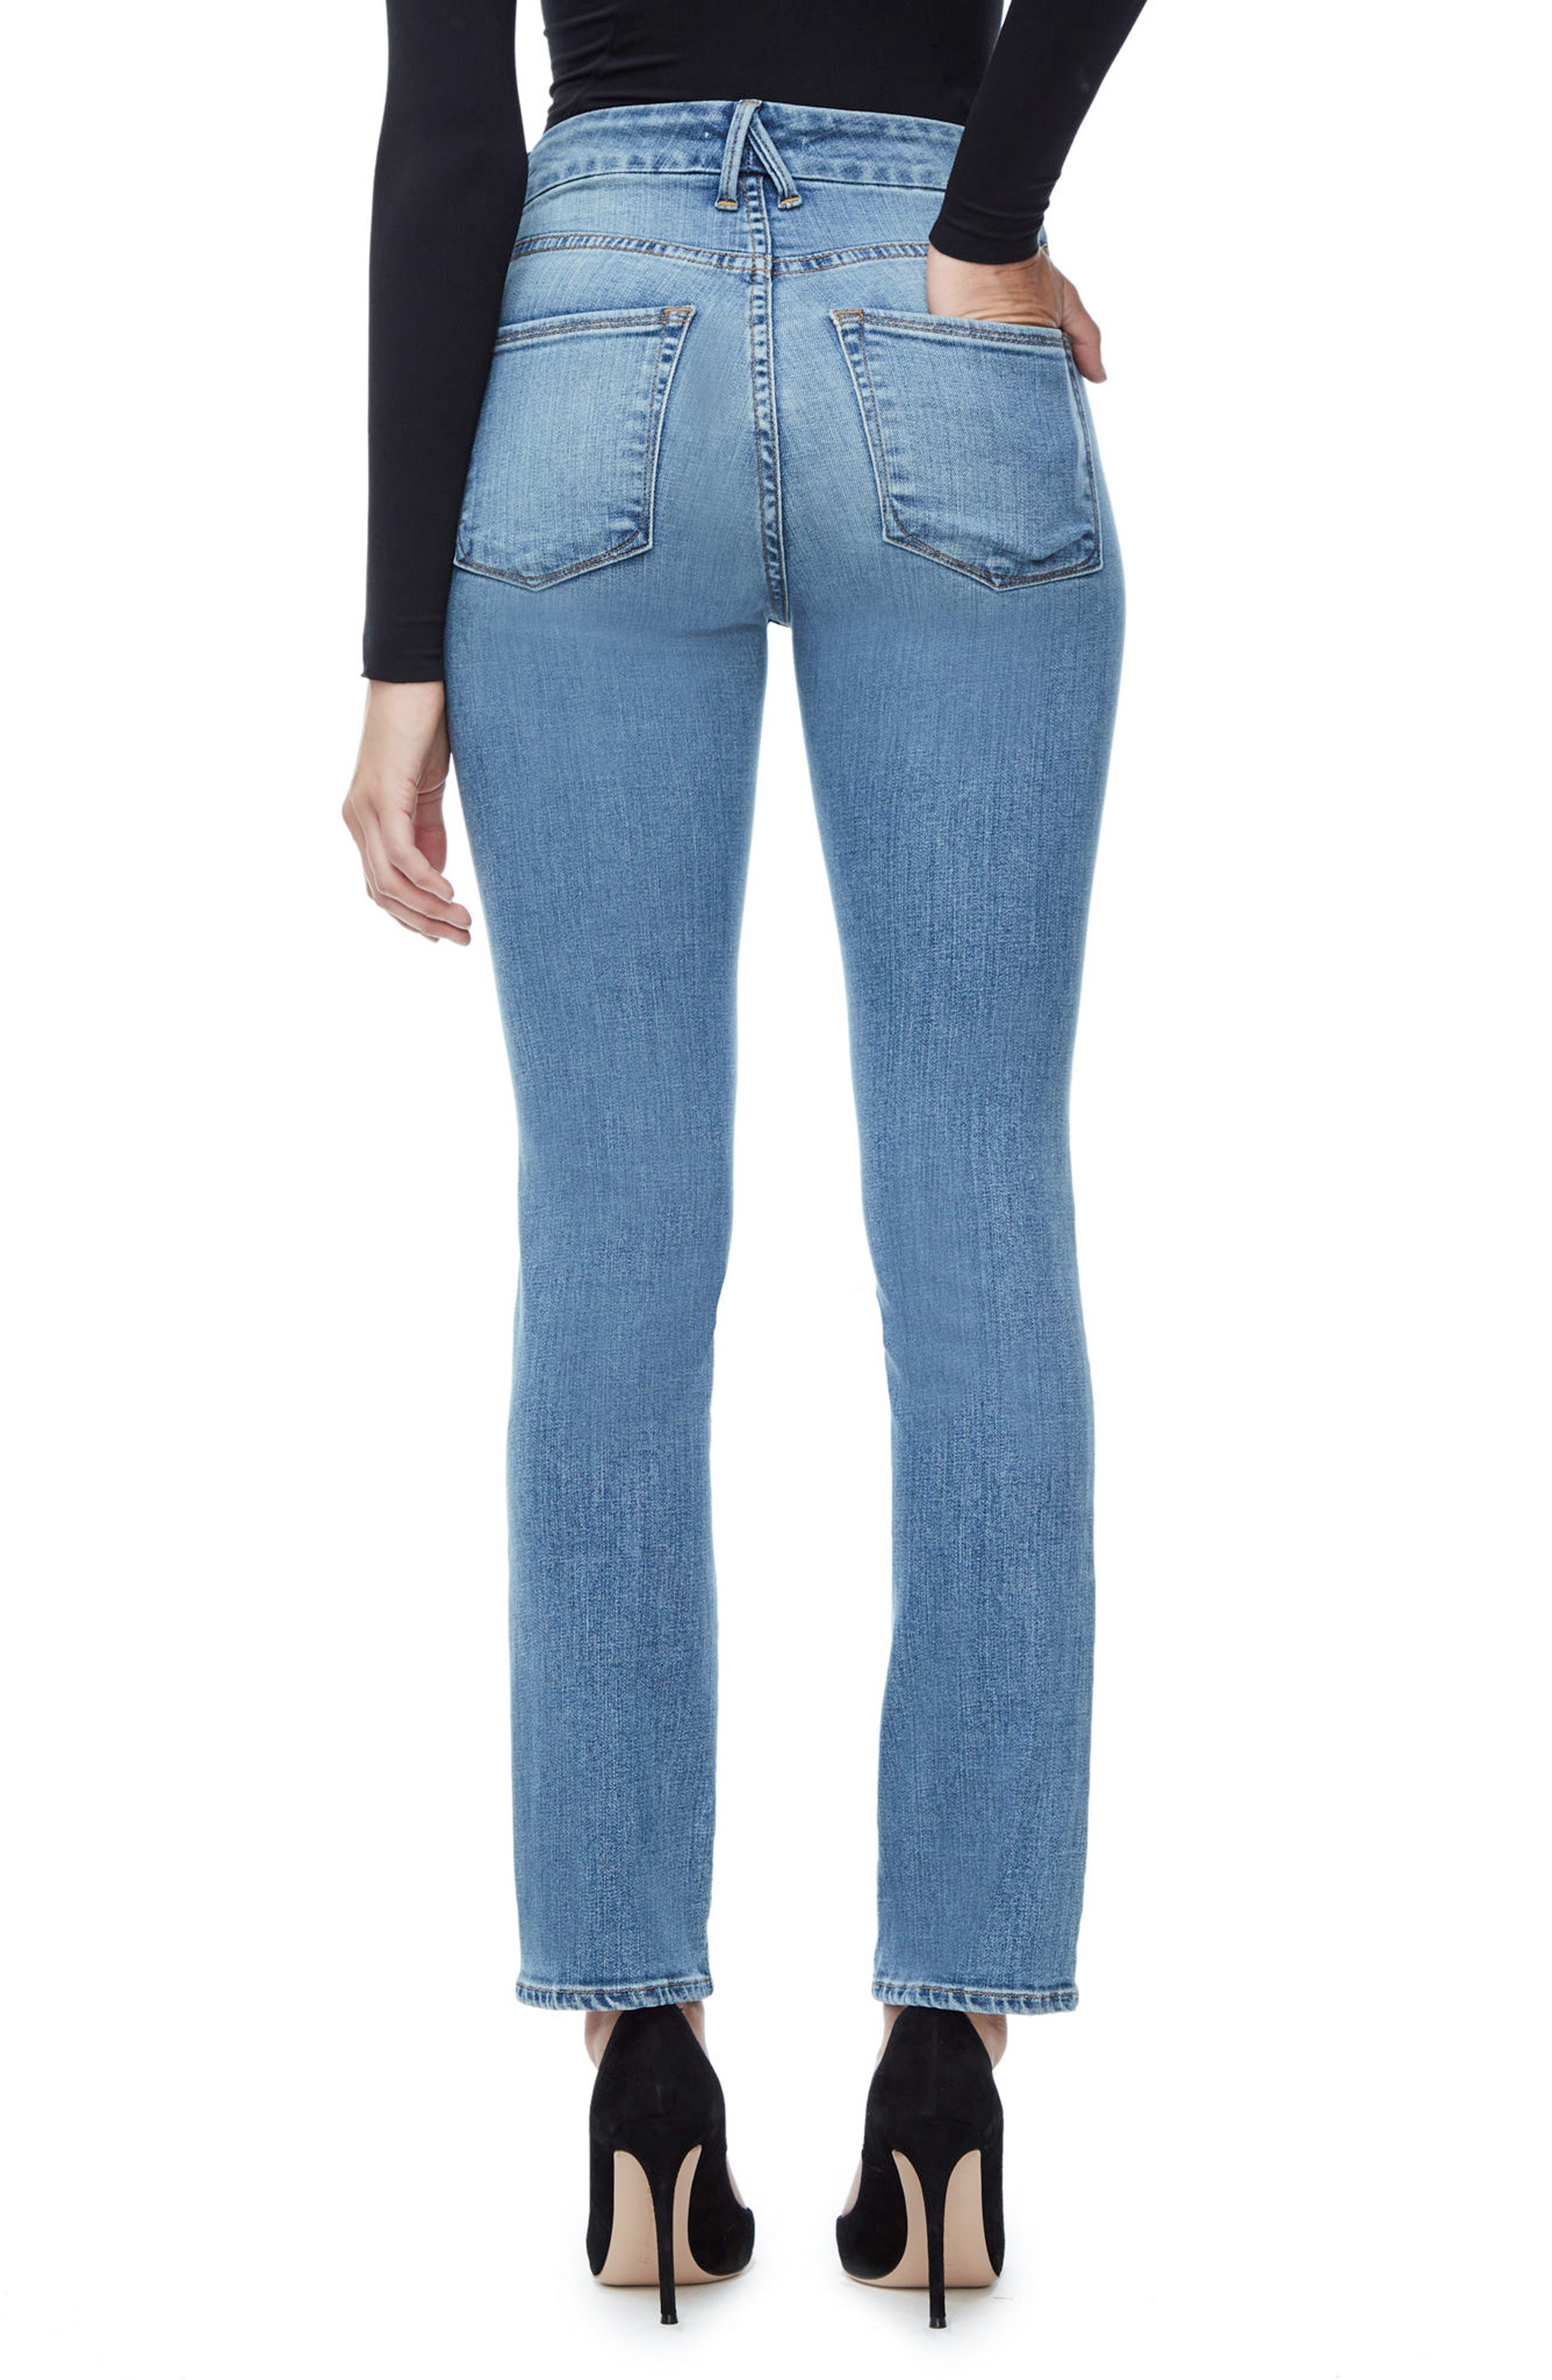 Alternate Image 2  - Good American Good Straight High Rise Jeans (Blue 087) (Regular & Plus Size)